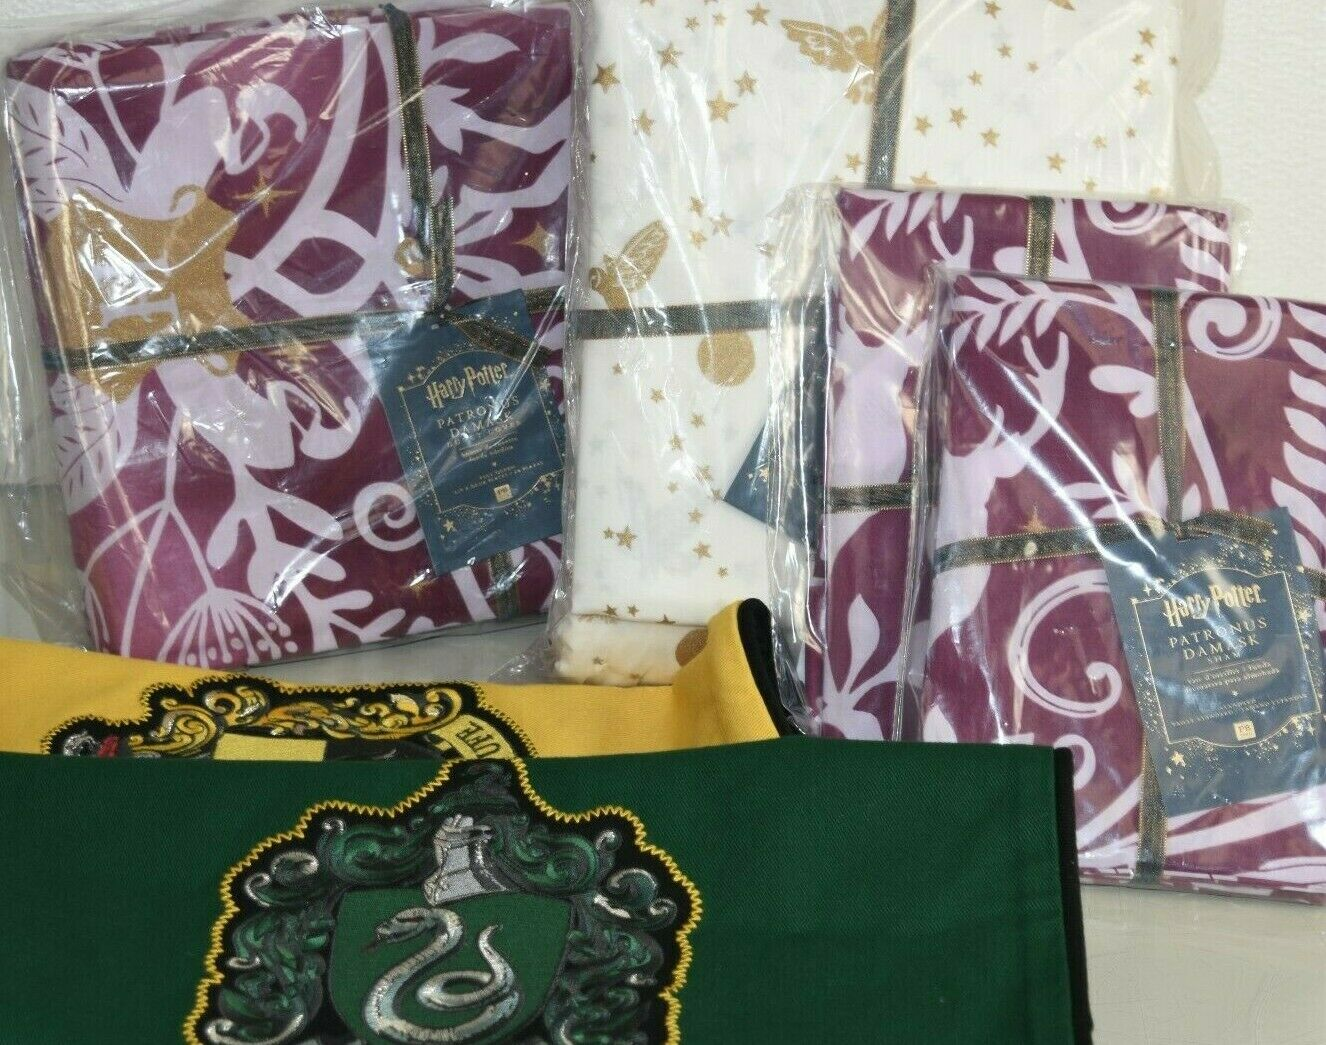 Nouveau POTTERY BARN Teen 9 pieces set harry potter Couette Sham Sheets Pillow Cover Queen